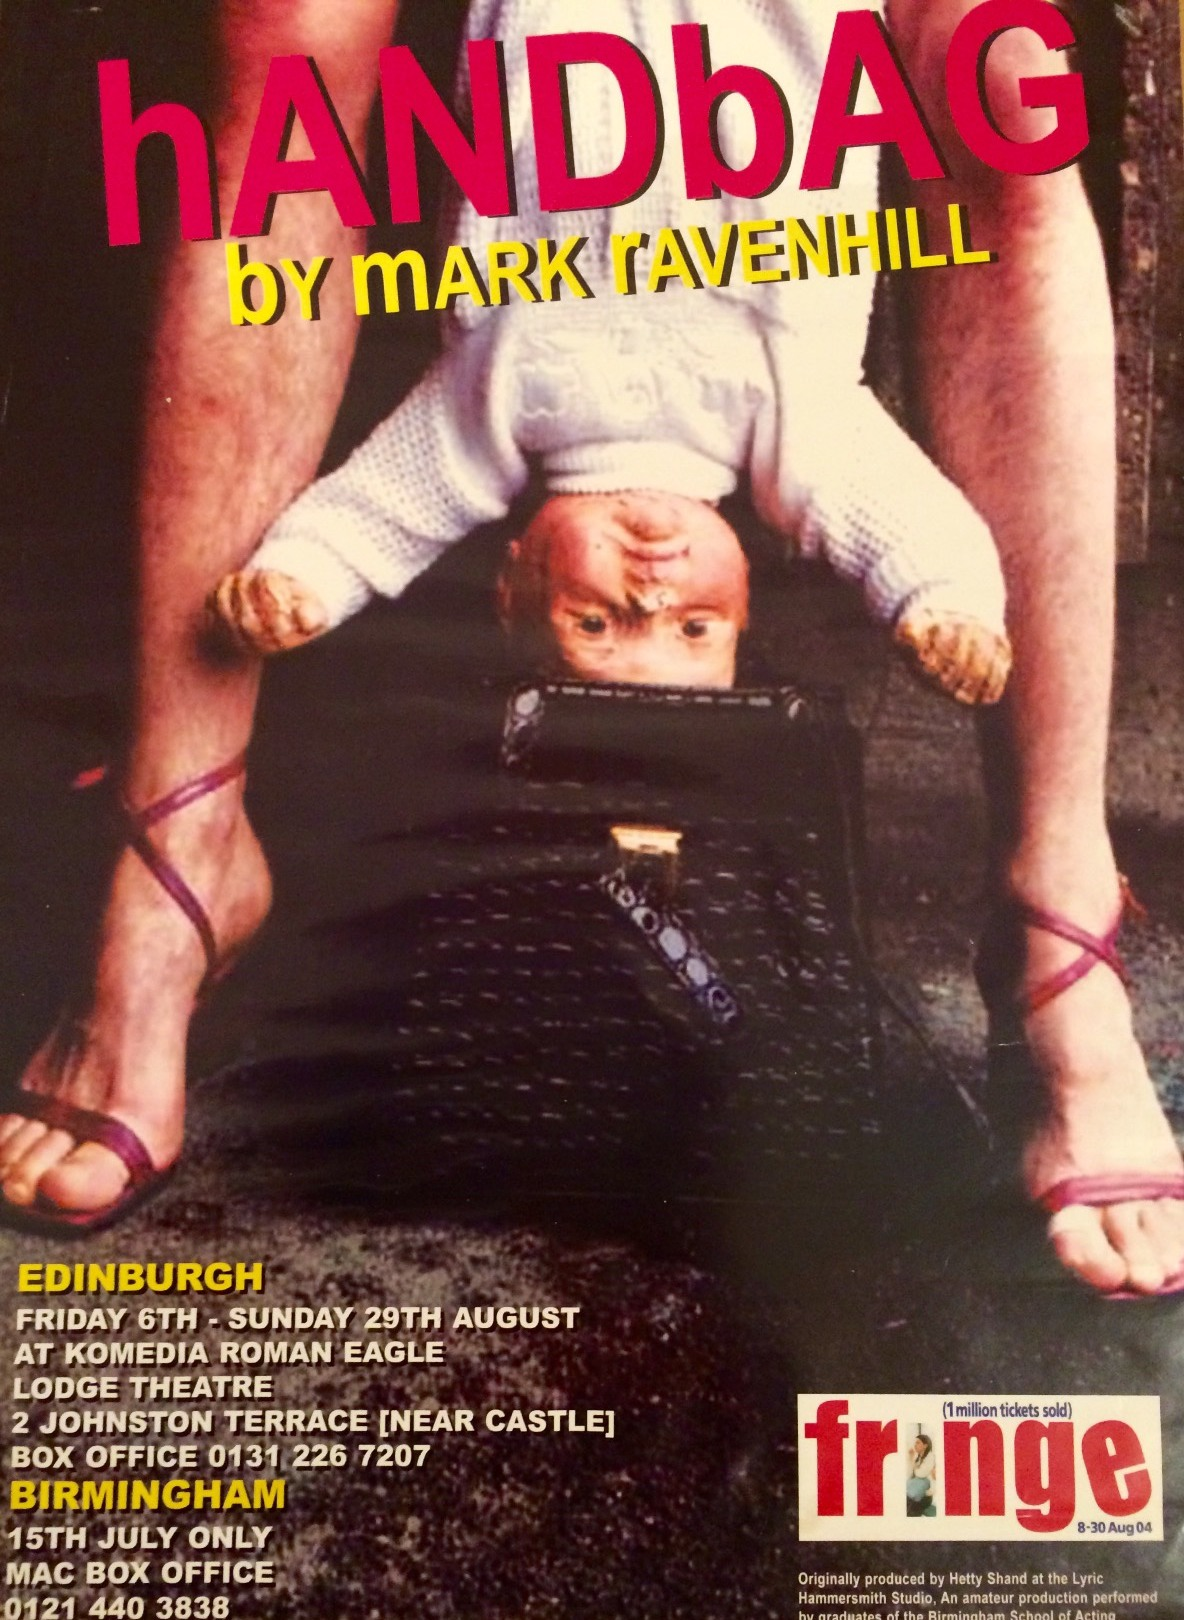 I DIRECTED AND PRODUCED hANDbAG FOR THE EDINBURGH FESTIVAL 2004. ThreeWeeks in Edinburgh:5 stars